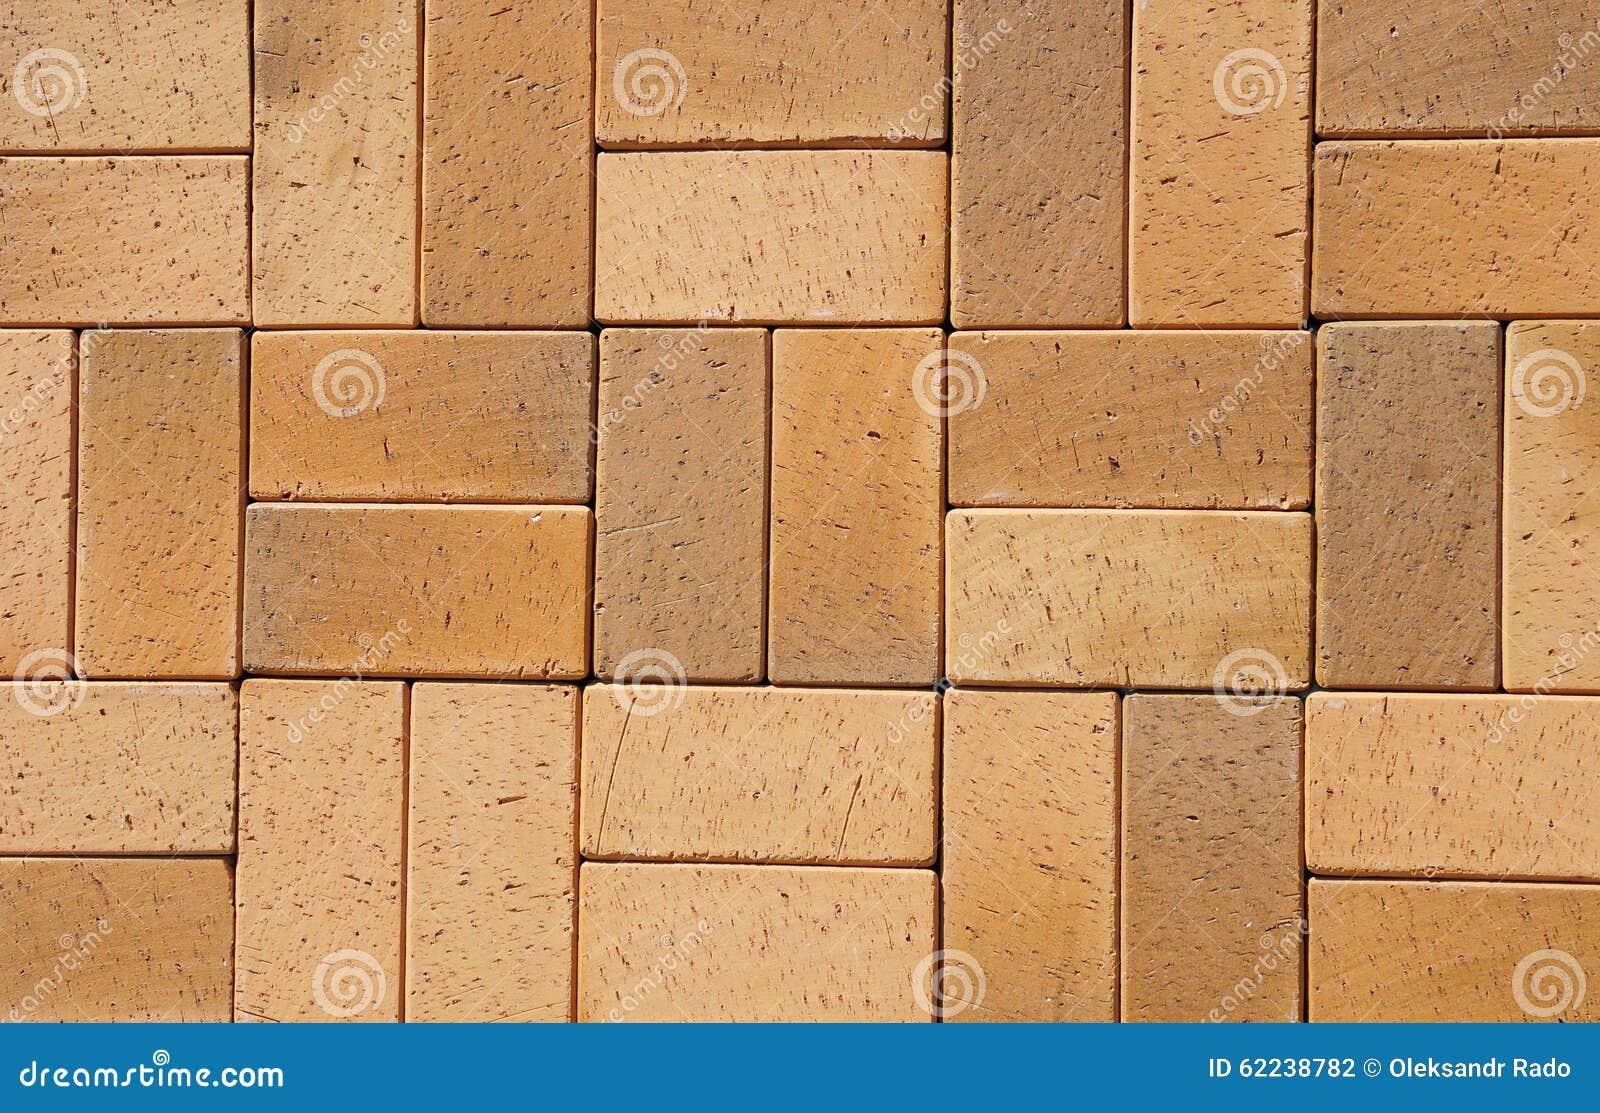 Fußboden Aus Klinker ~ Fußboden aus klinker bodenklinker boden keramische beläge